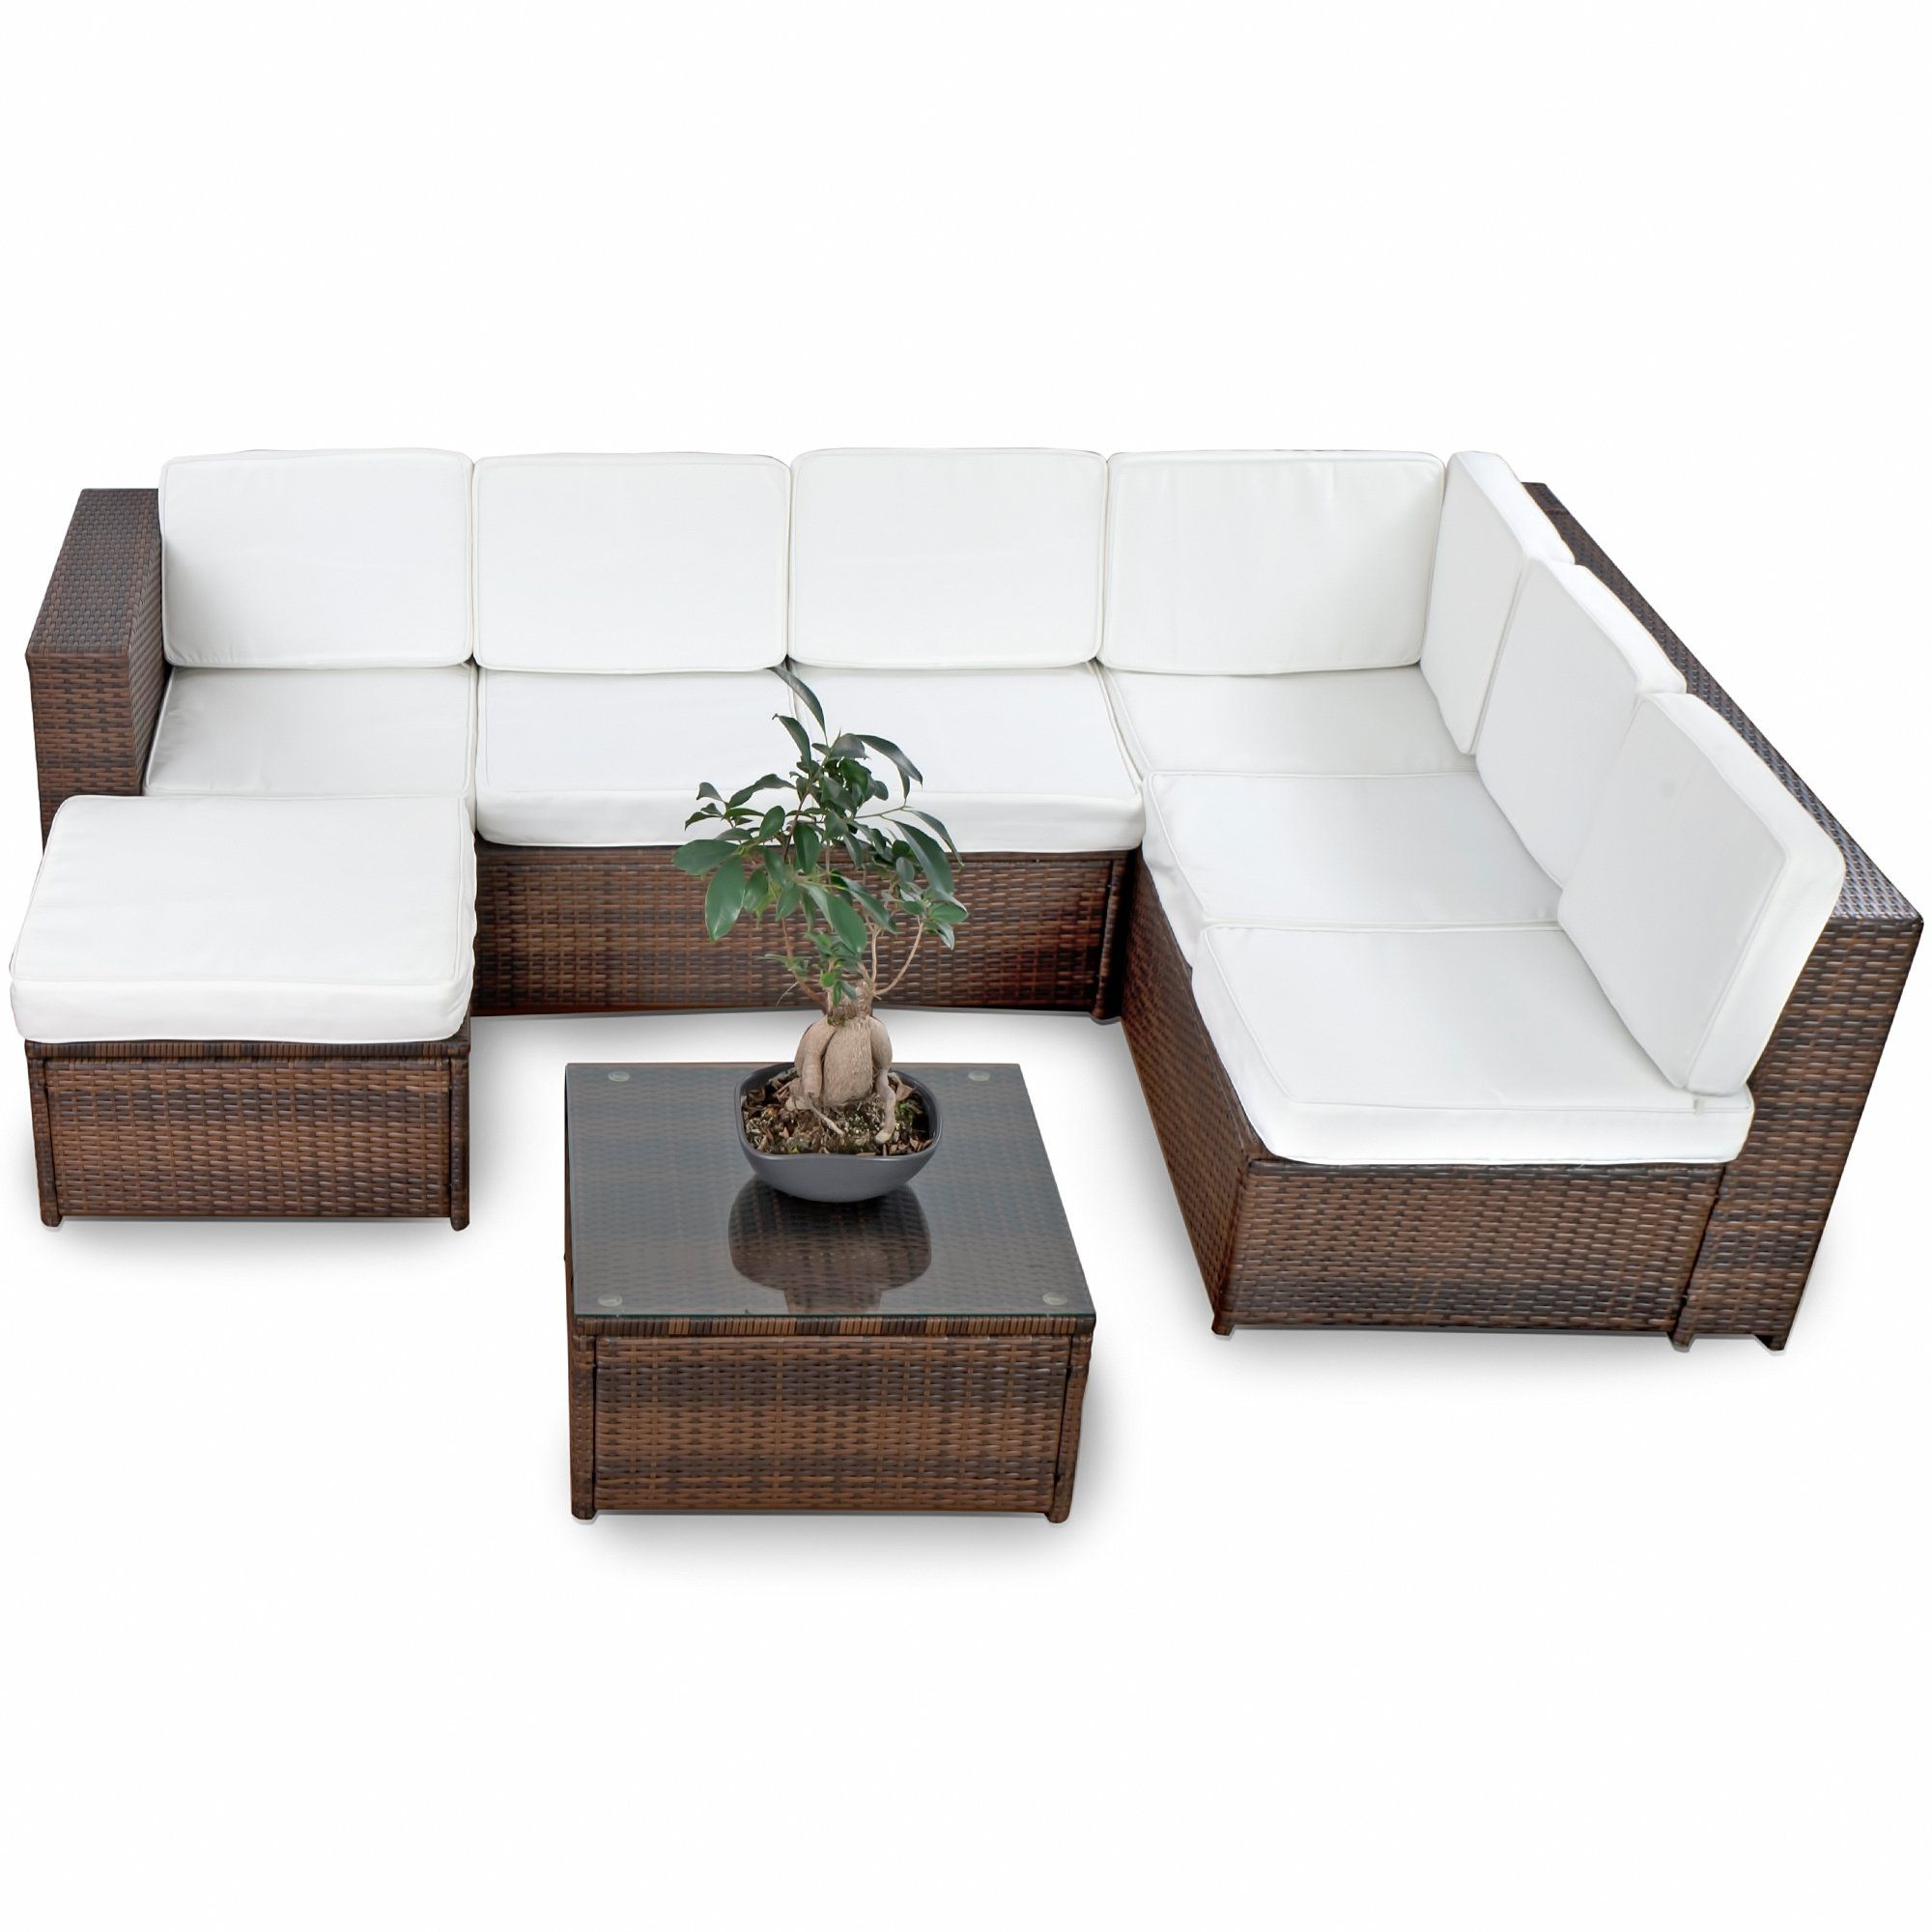 Full Size of Lounge Sofa Polyrattan Outdoor Couch Ausziehbar 2 Sitzer Gartensofa Rattan Garden Set Grau 2 Sitzer Balkon Tchibo Xinro 19tlg Xxxl Gartenmbel Gnstig Esstisch Sofa Polyrattan Sofa